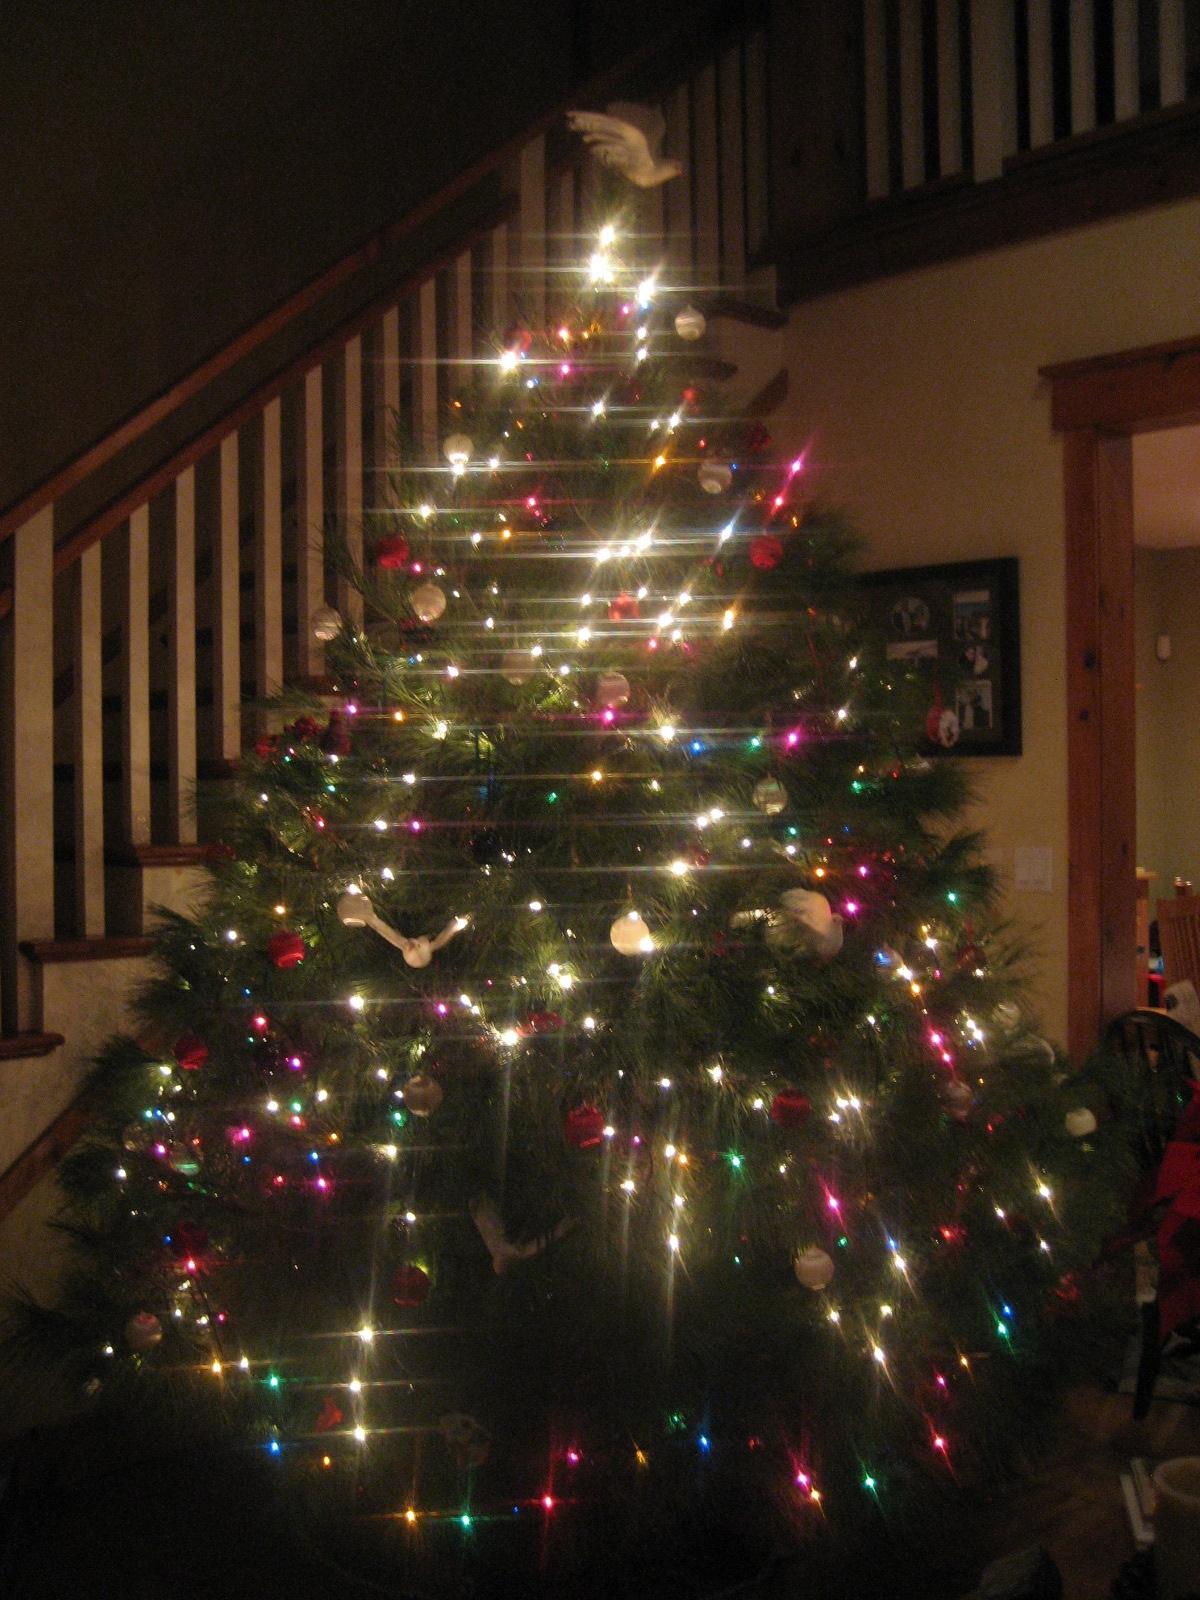 Jen Melanson: The biggest Christmas tree ever!